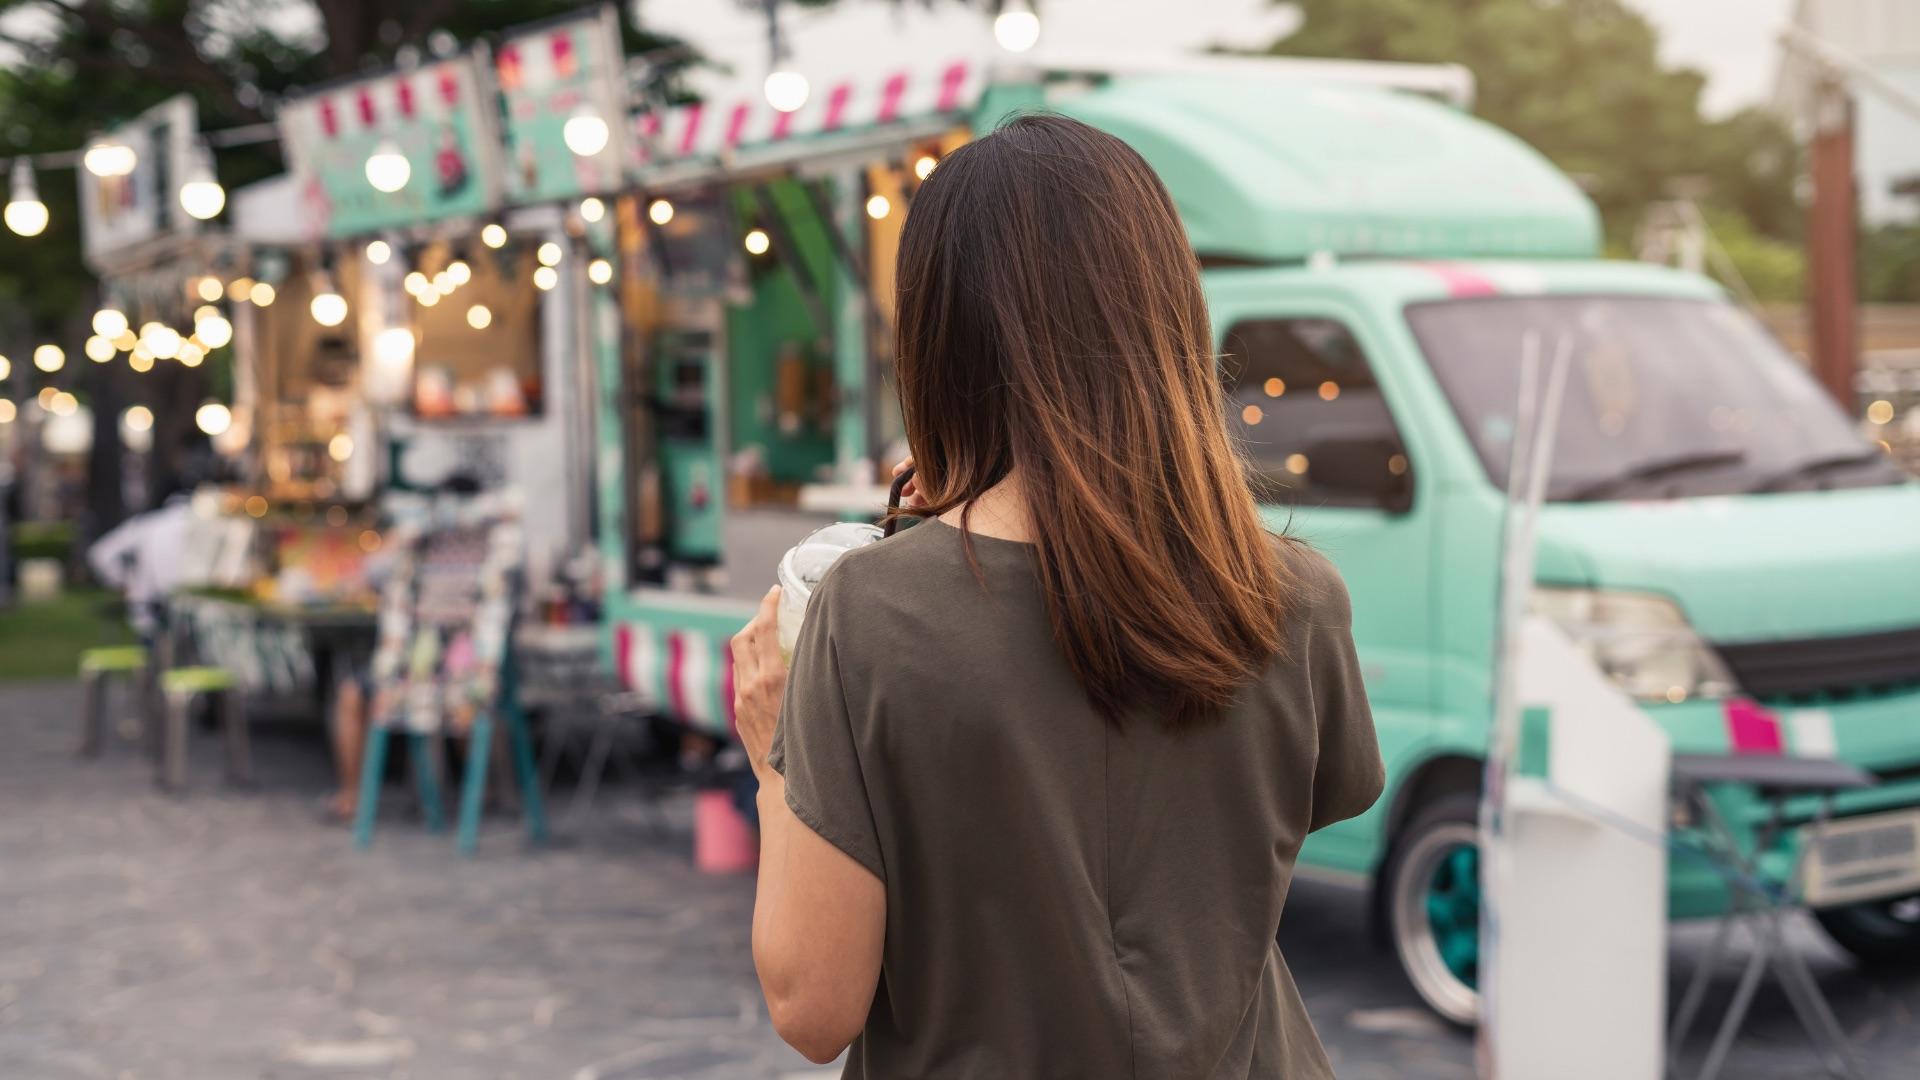 cosa fare a Verona - food truck